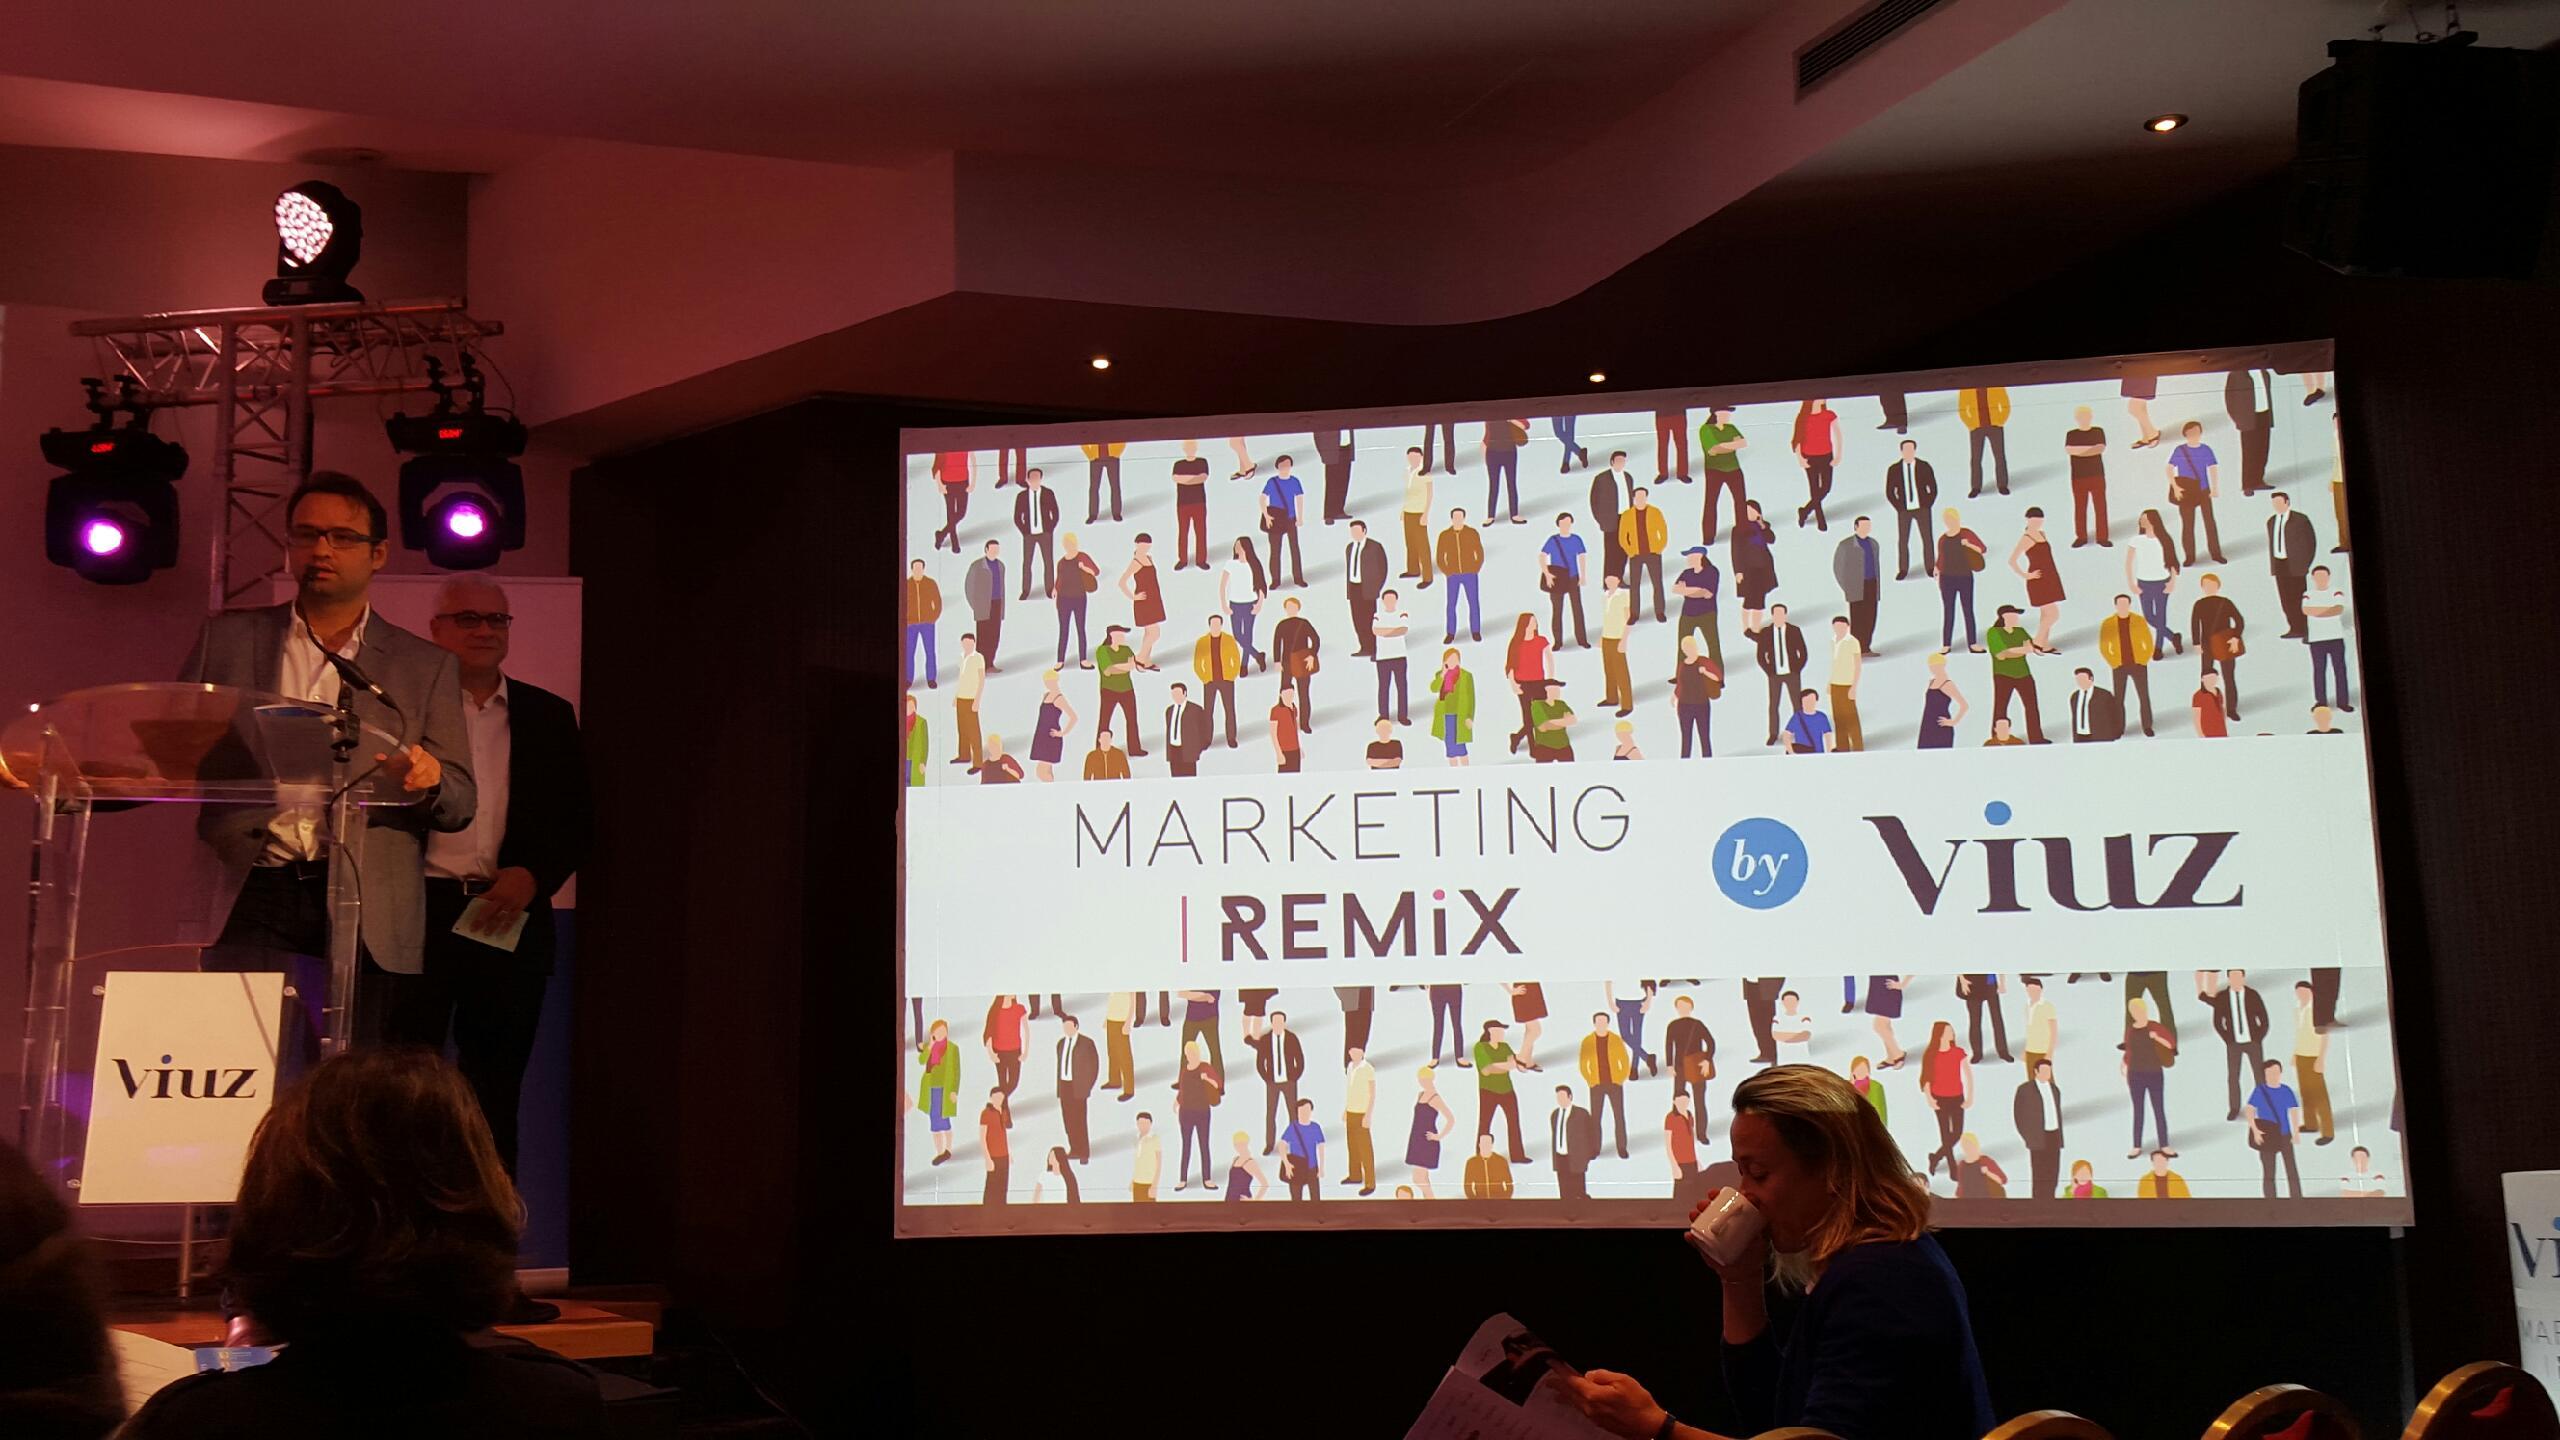 Marketing-Remix-Viuz